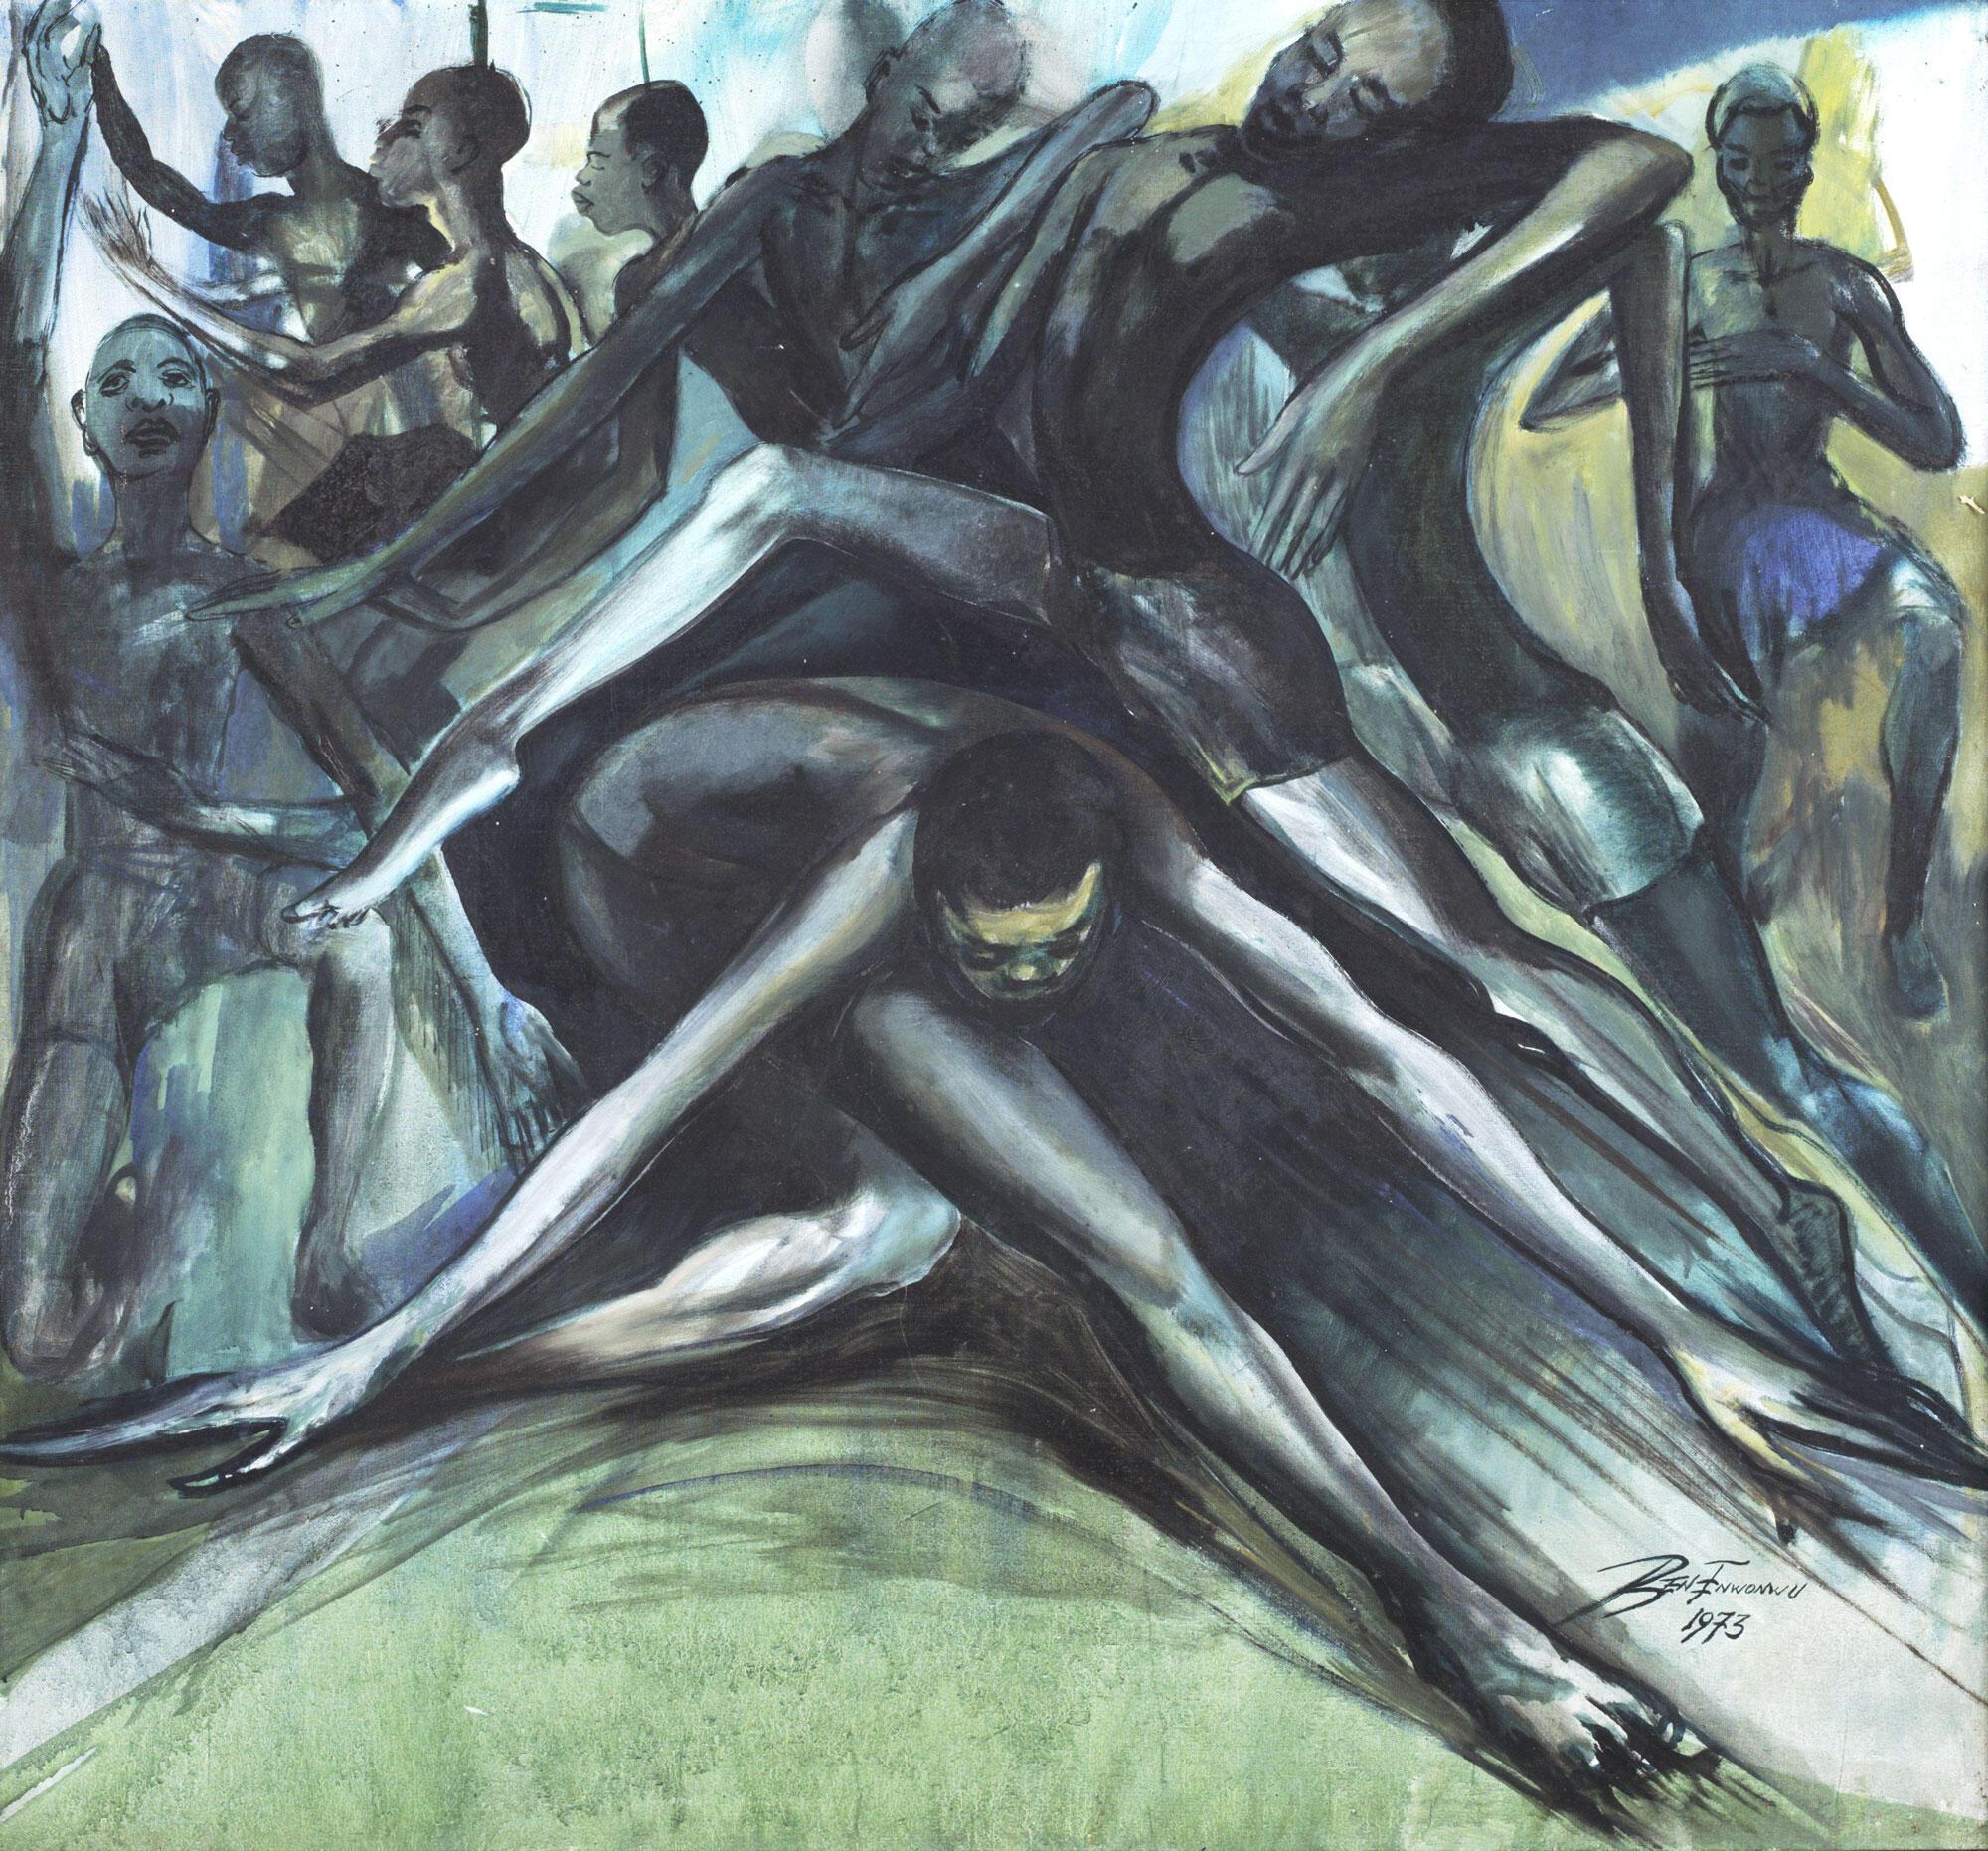 'Africa Dances' by Ben Enwonwu (Nigerian, 1917-1994)